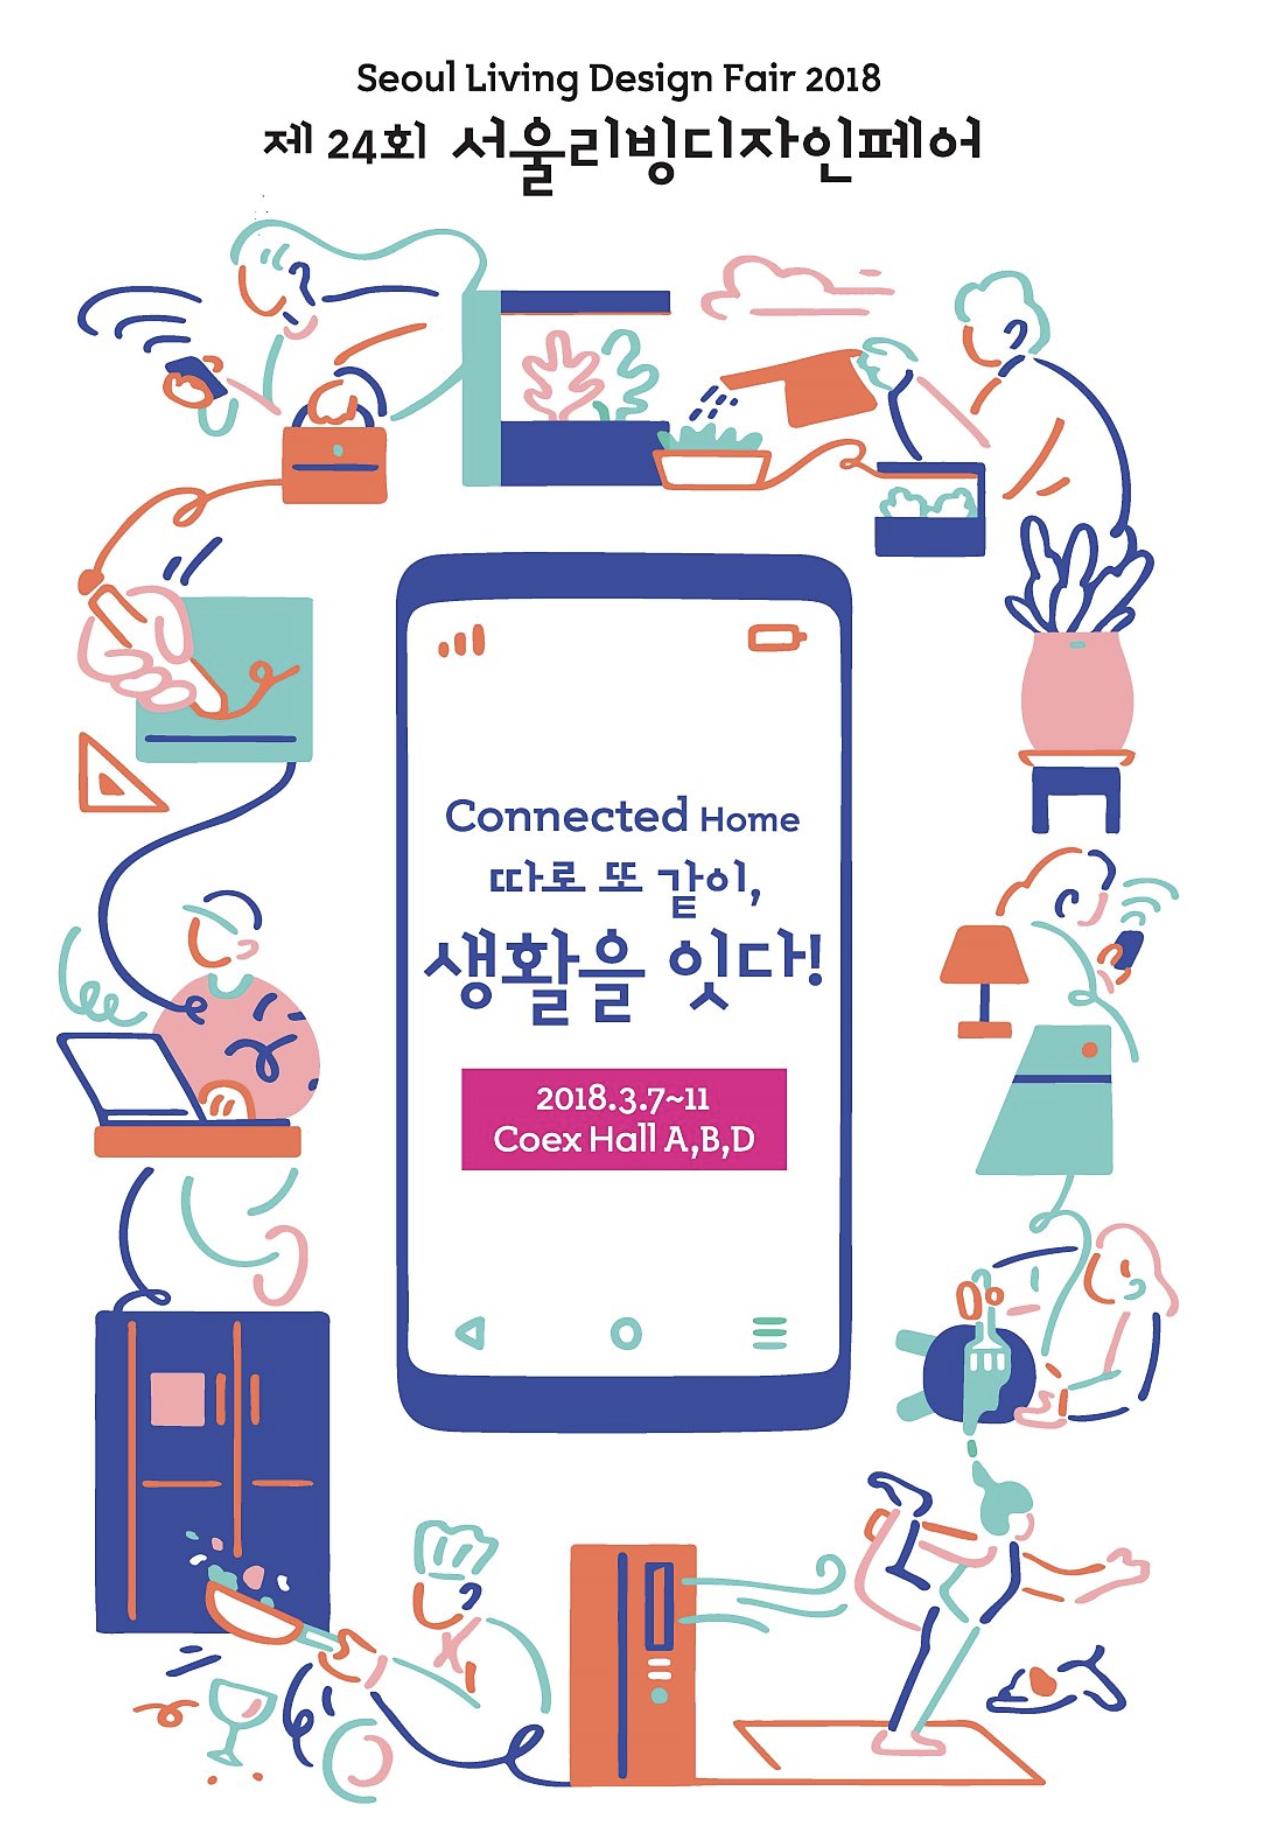 Happy Design House- 'Seoul Design Living Fair 2018'  행복이가득한집-'서울리빙디자인페어 2018'